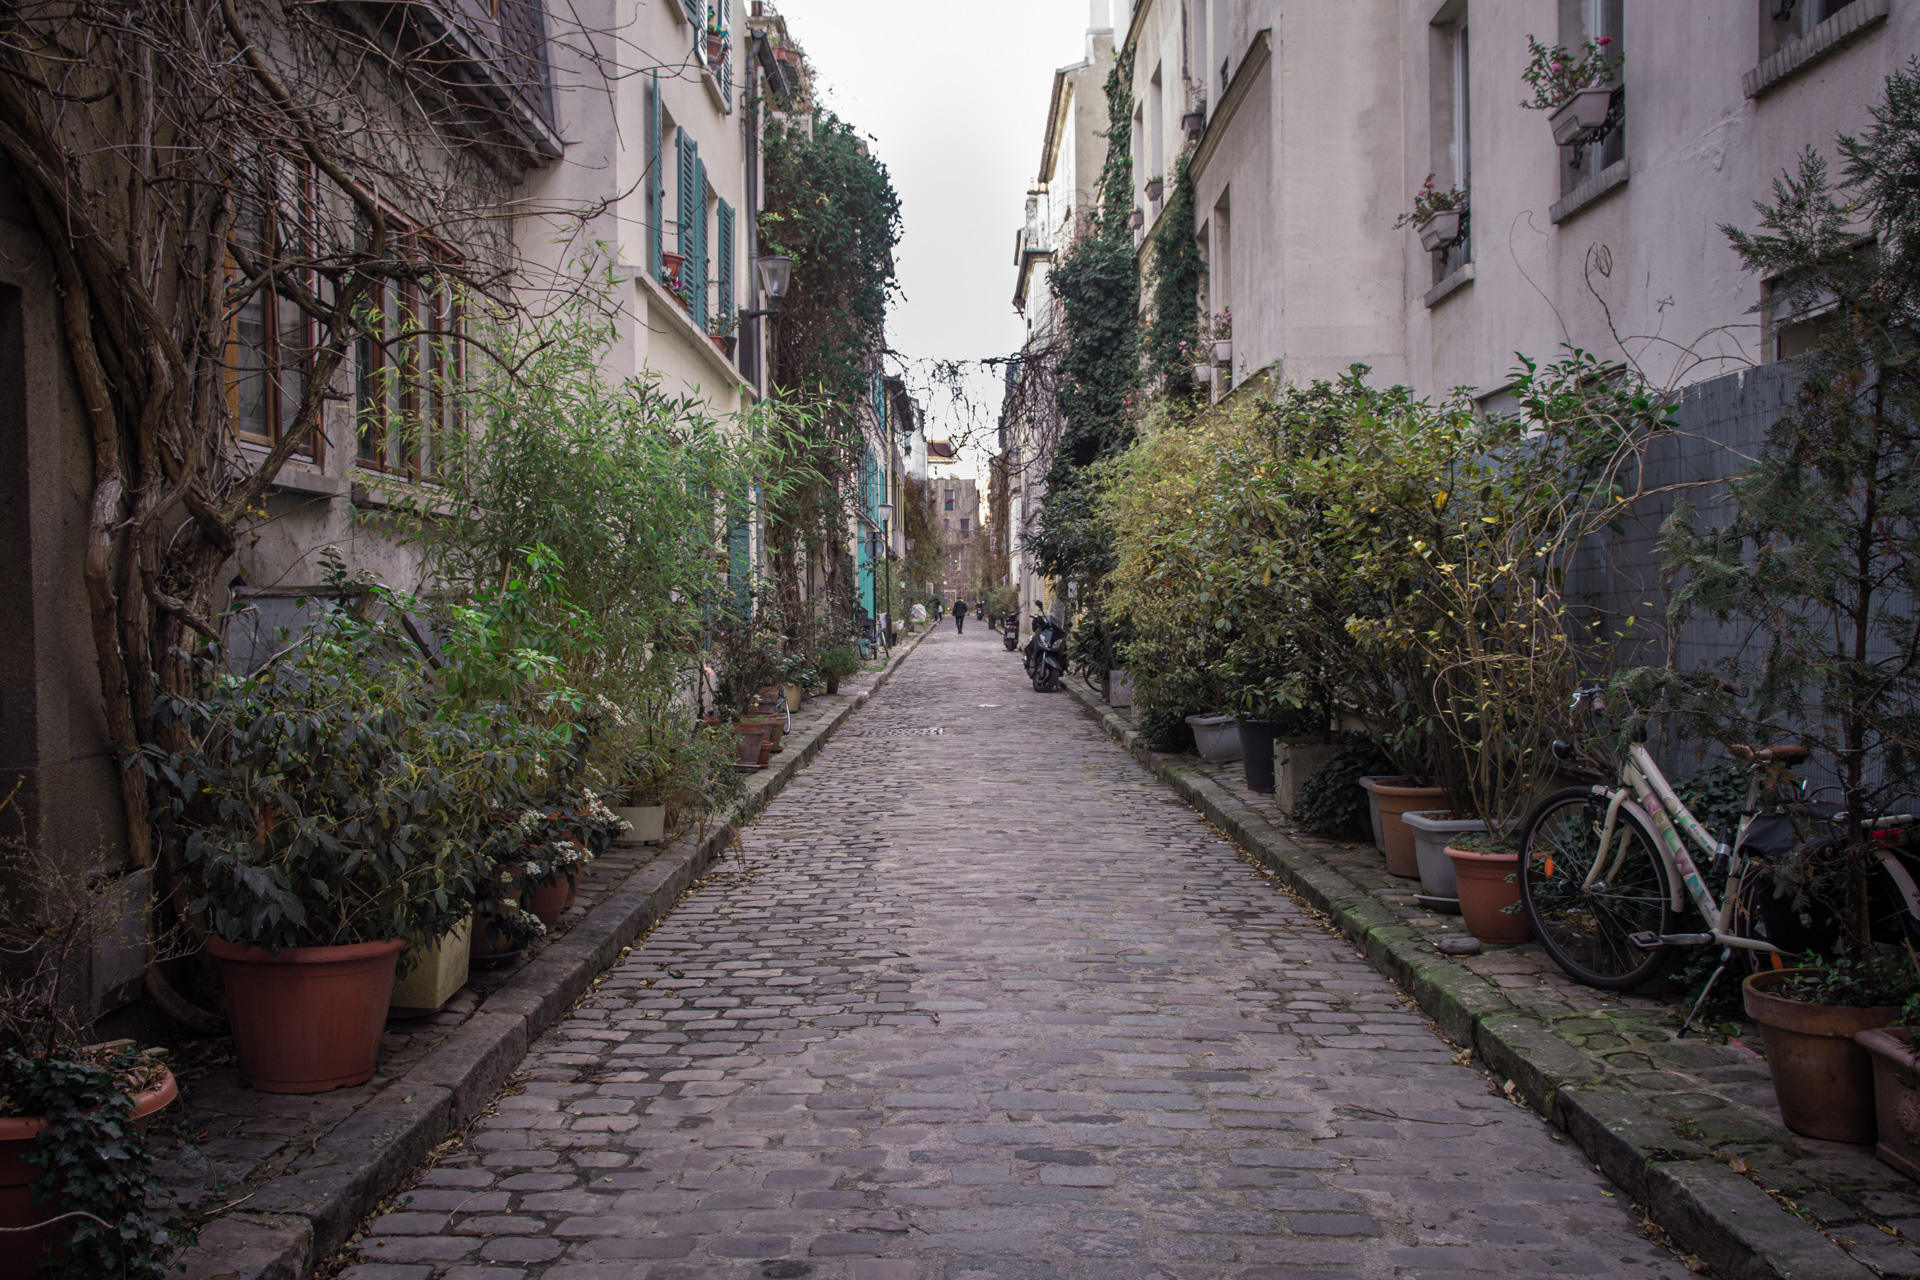 Petite rues de Paris